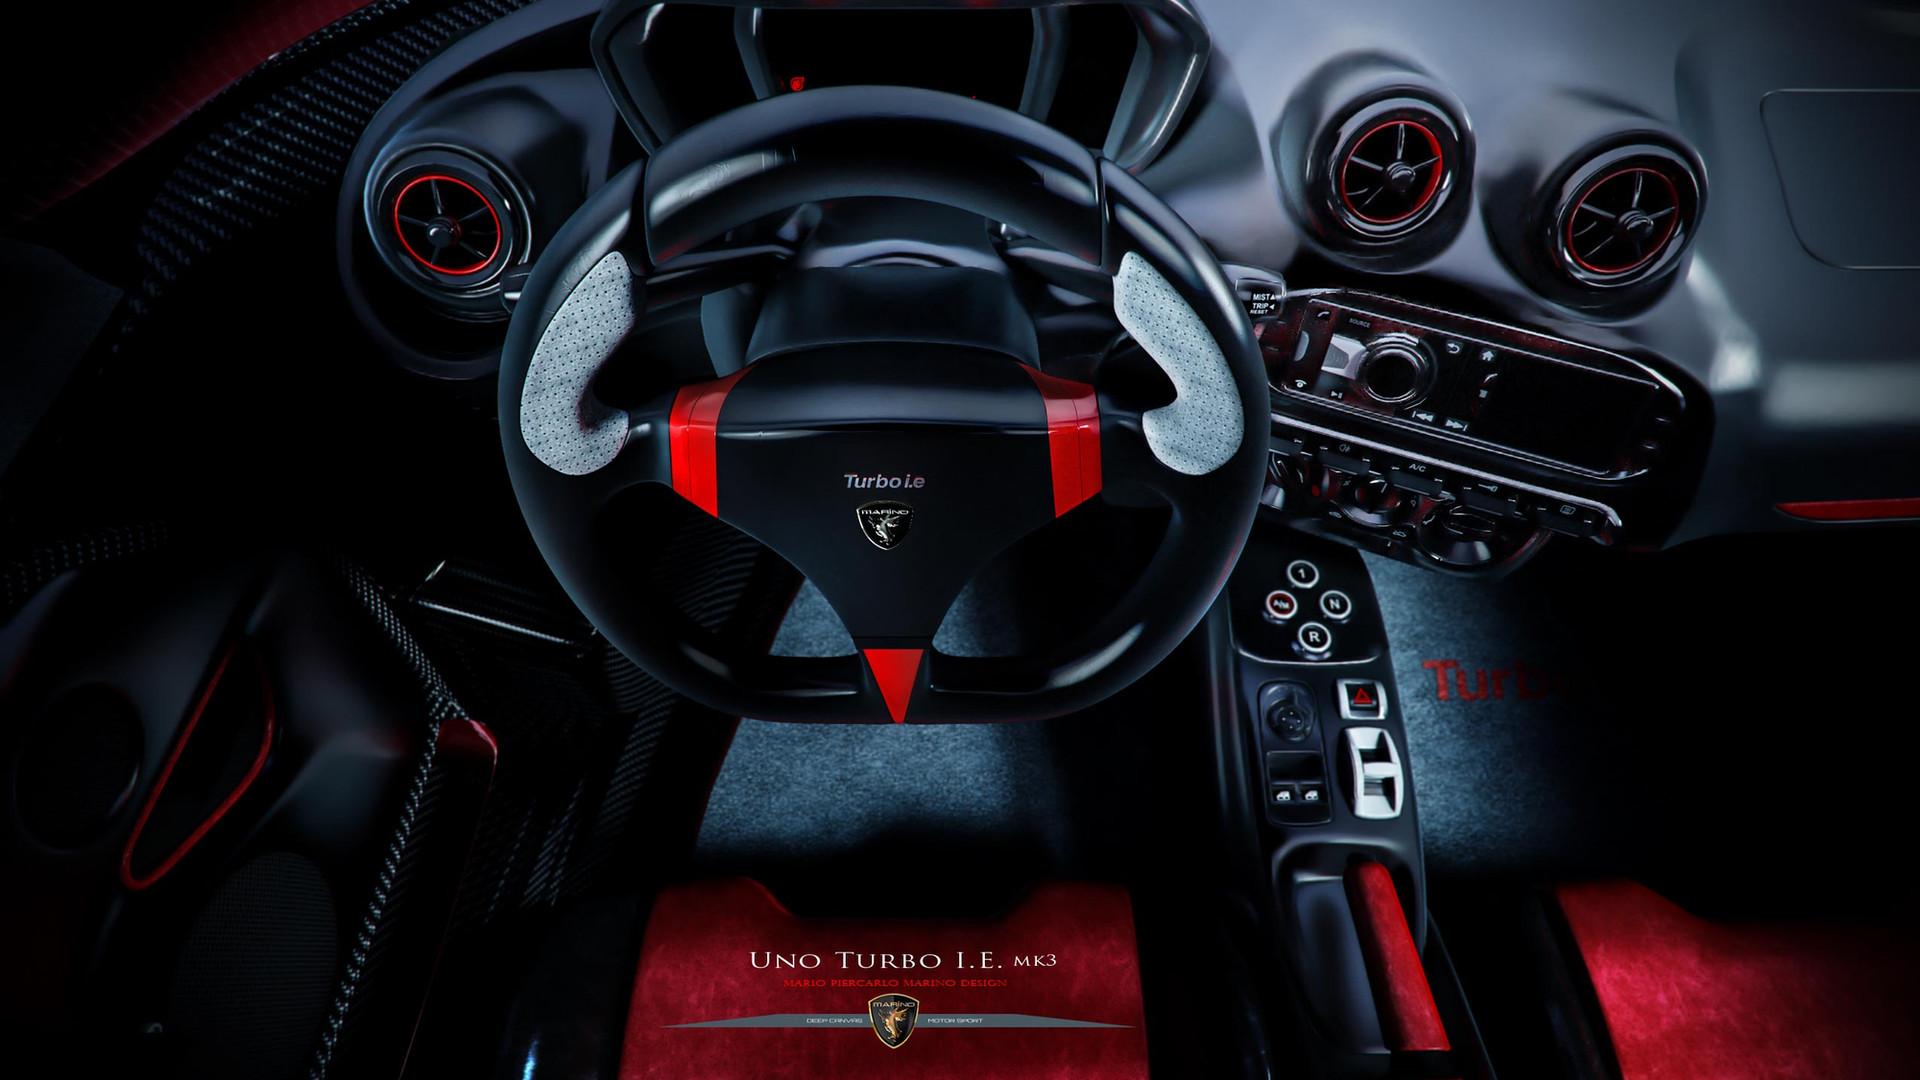 Uno-Turbo-mk-3-interiors-2.jpg